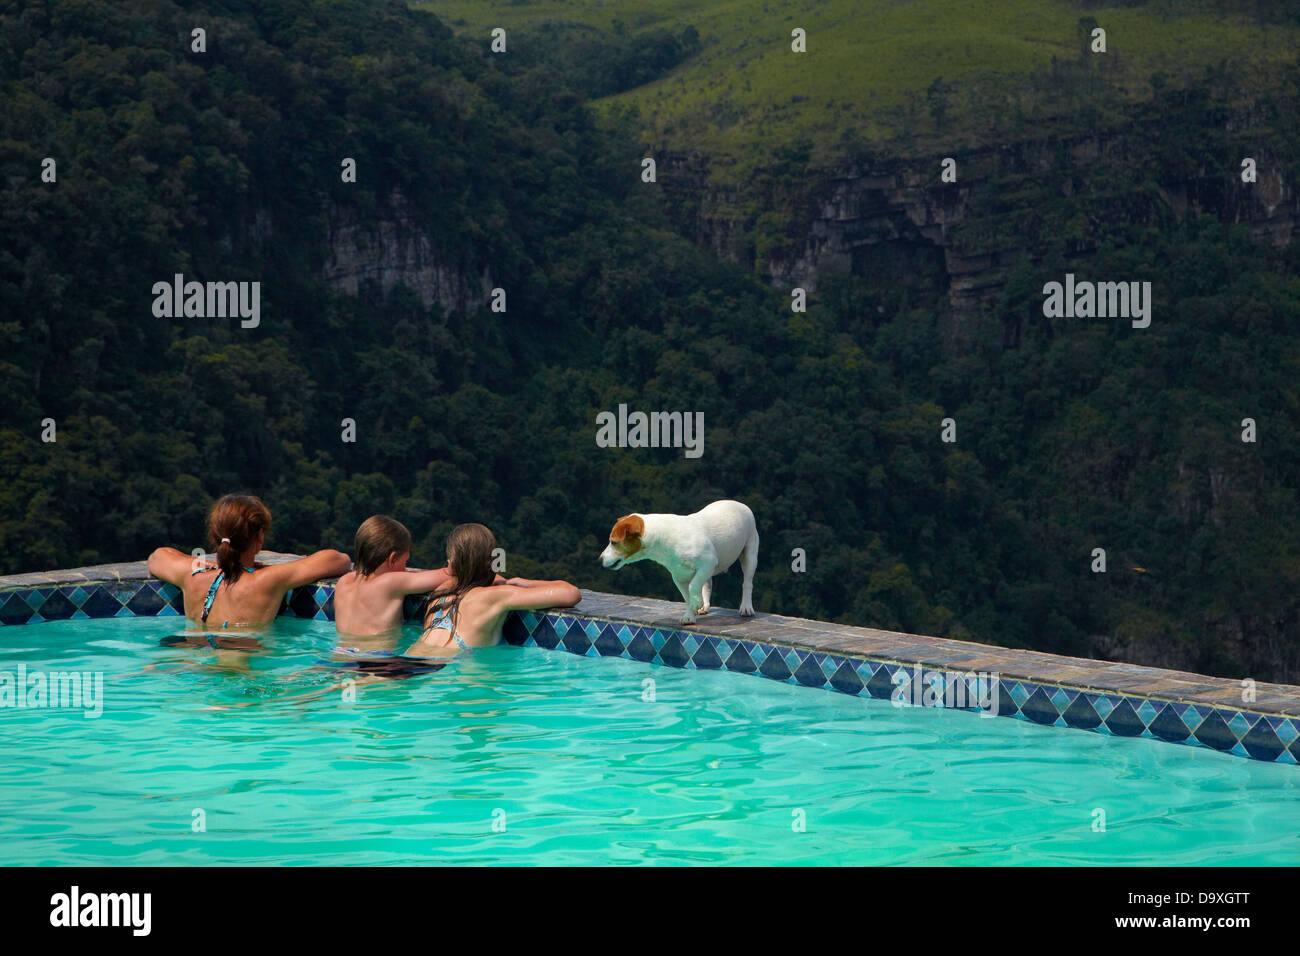 Swimming pool, Panorama Rest Camp, Graskop, Mpumalanga Escarpment, South Africa - Stock Image